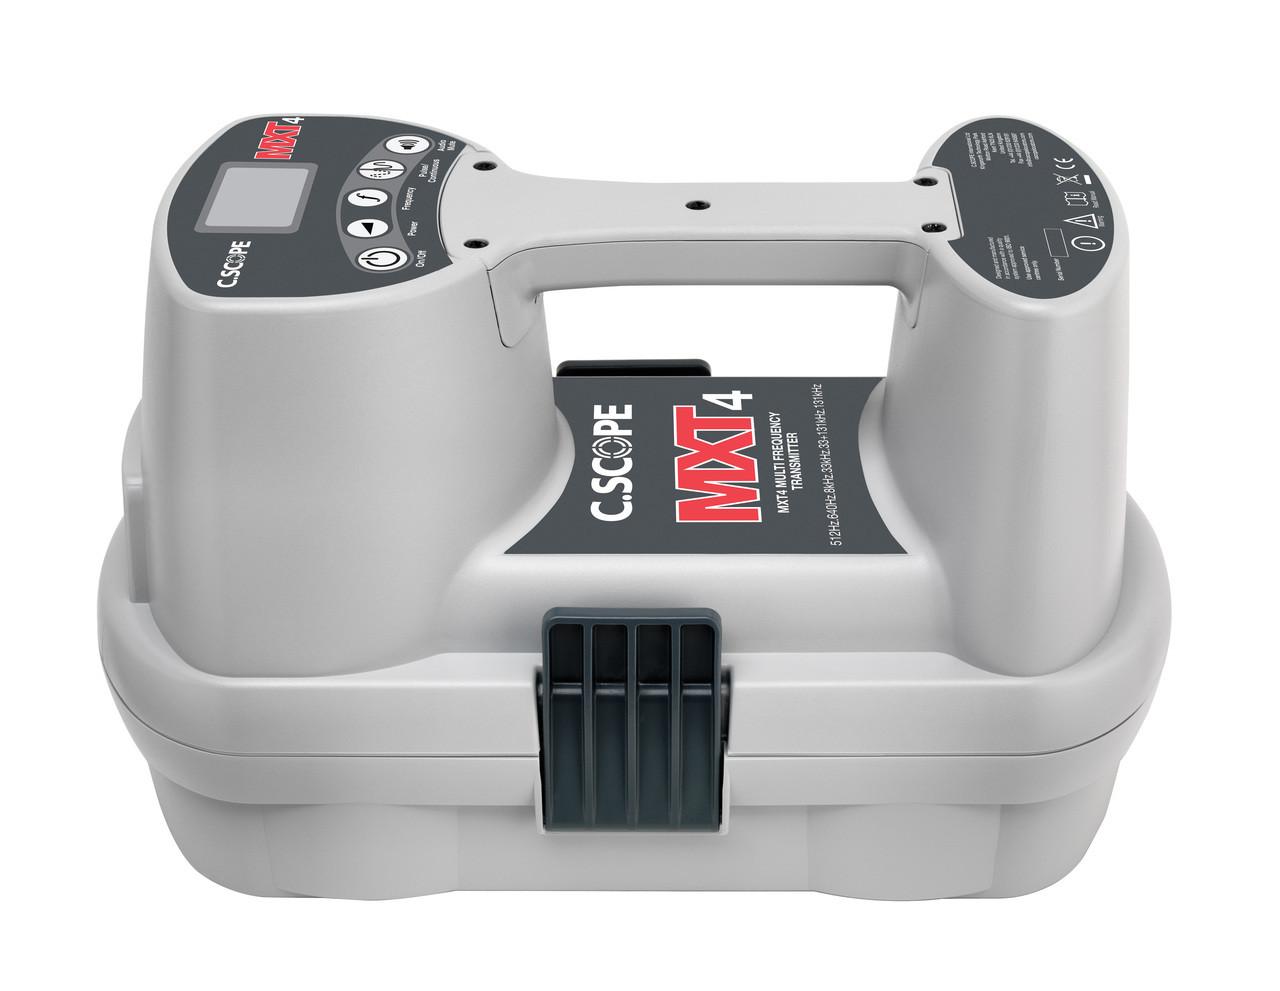 C-Scope MXT4-D Multi Genny - Muti Frequencies & Data Logging